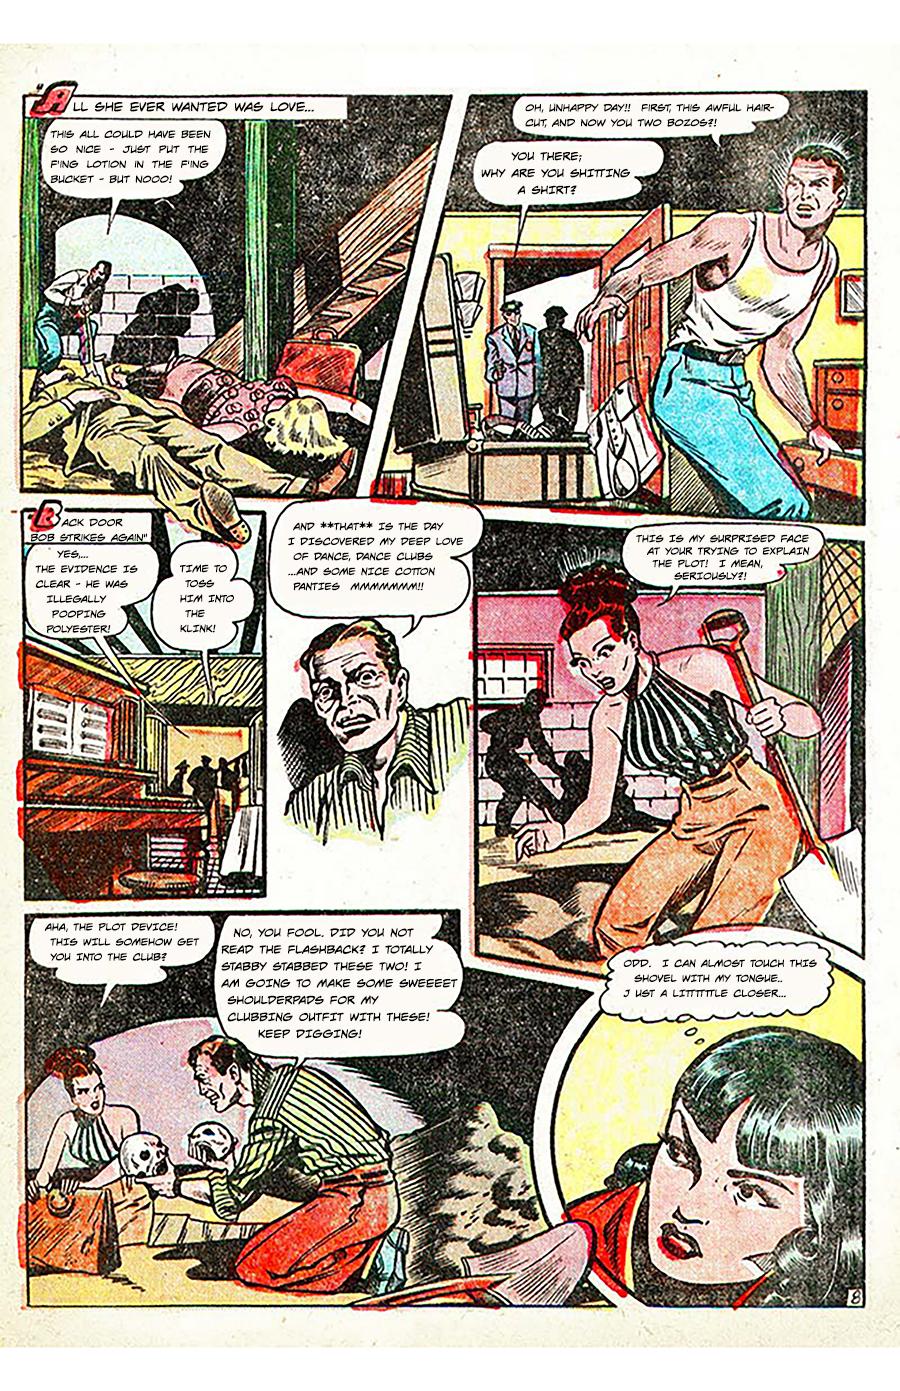 Random Lady – Prison-man-lady Page 8